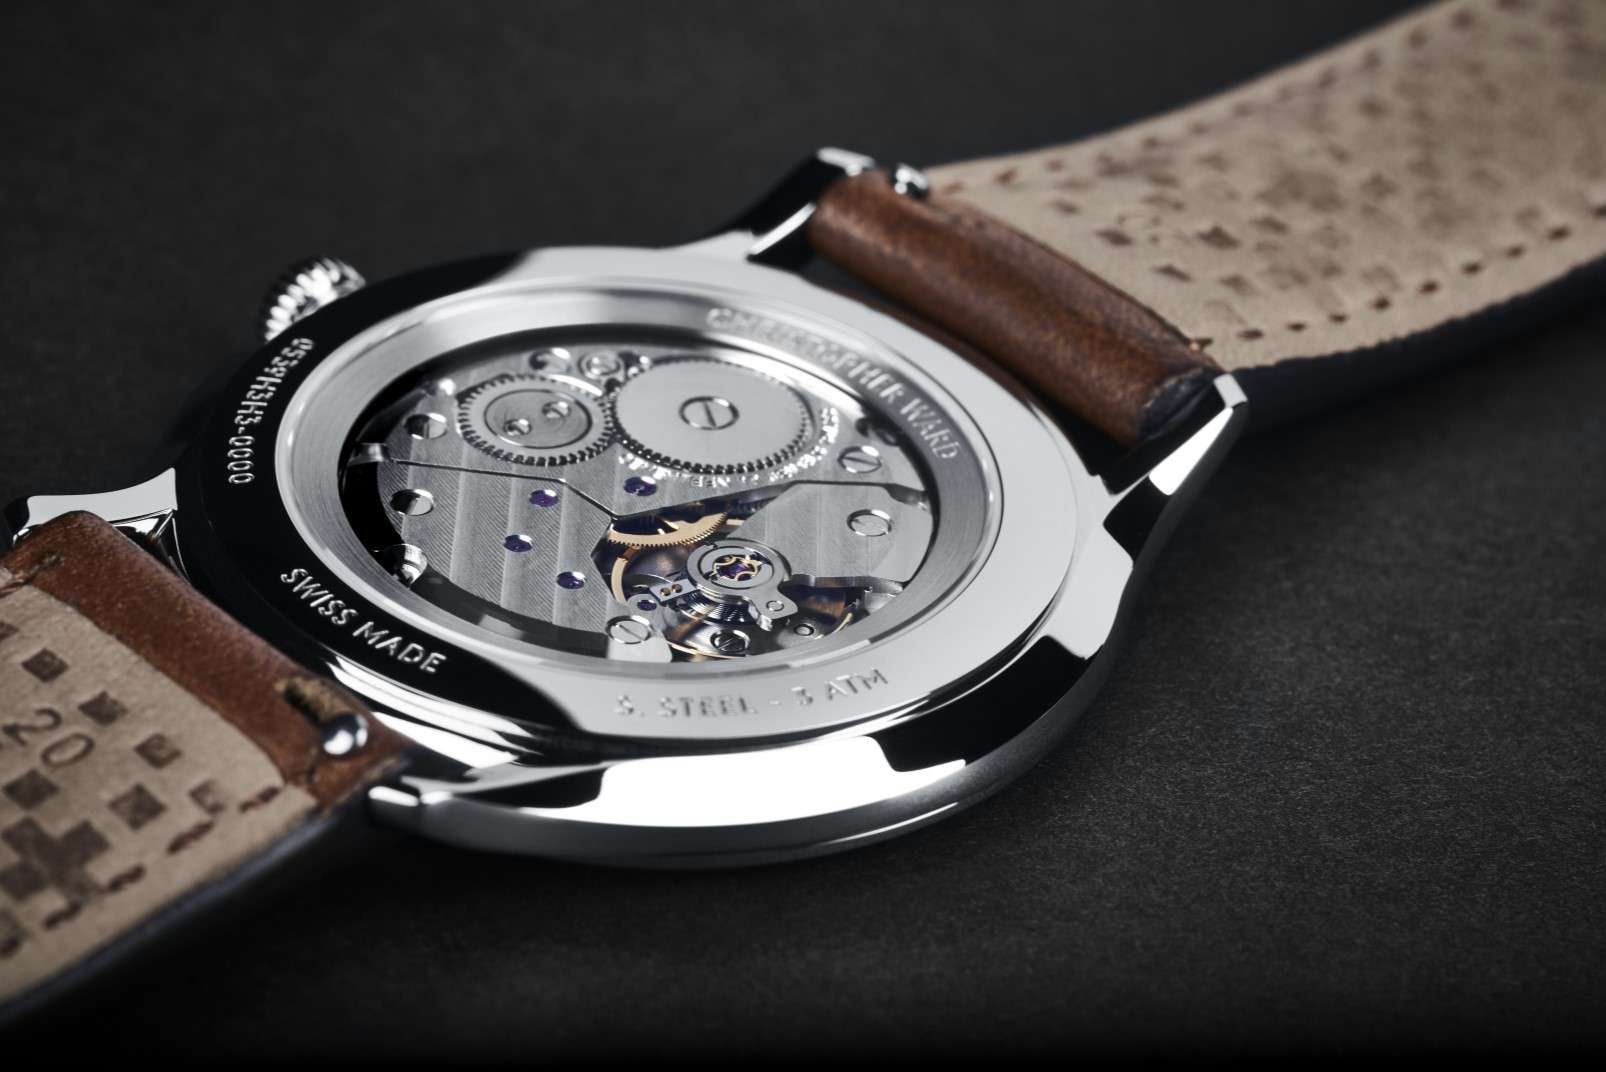 Christopher Ward C5 Malvern 595 dress watch caseback